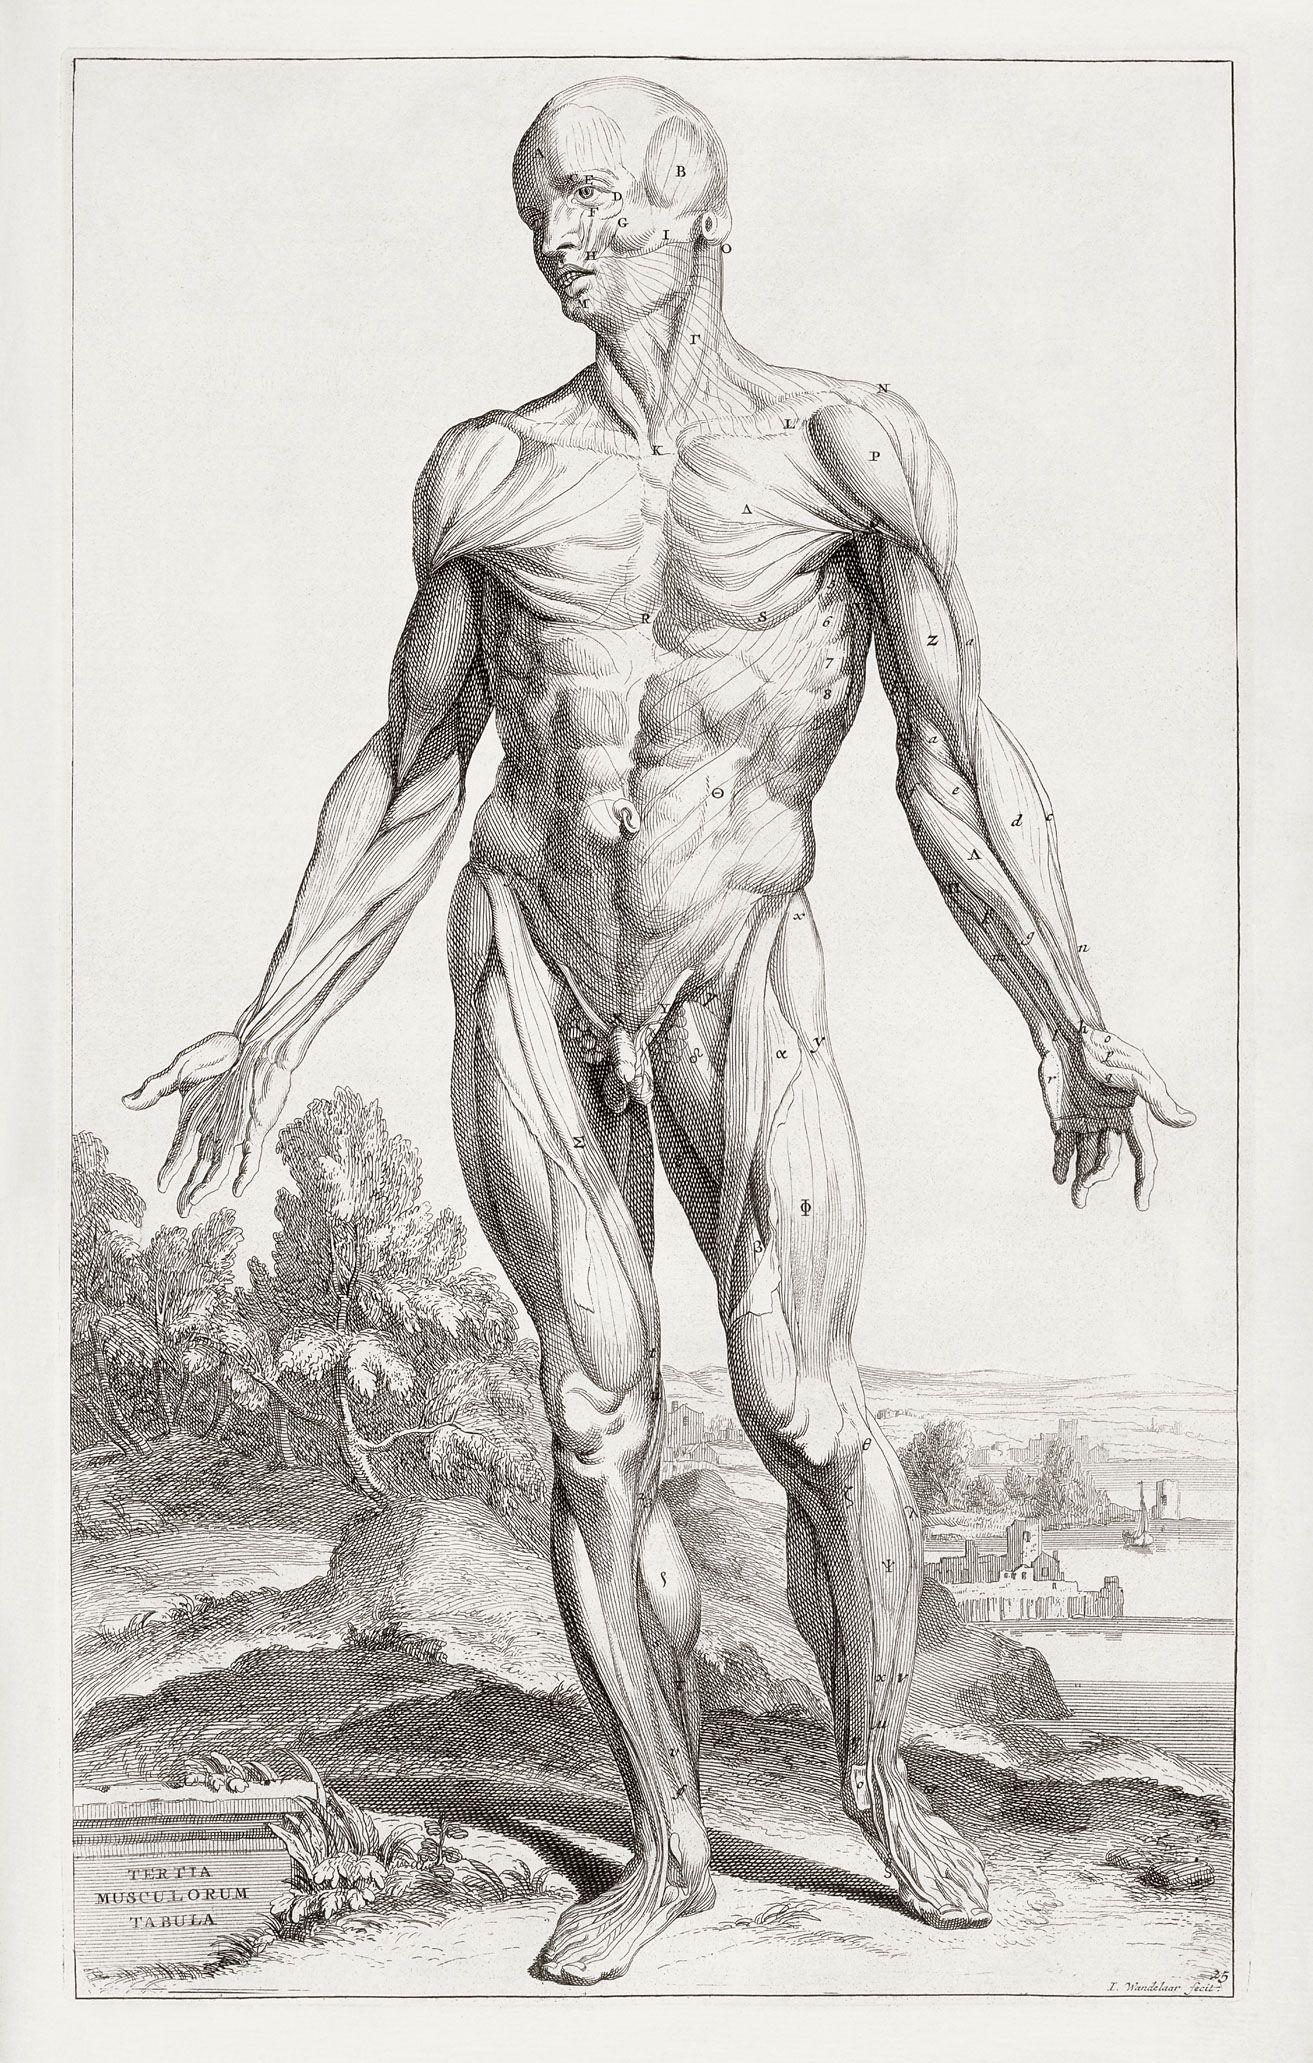 Detailed Anatomy drawing | anatomy | Pinterest | Anatomy and Anatomy ...